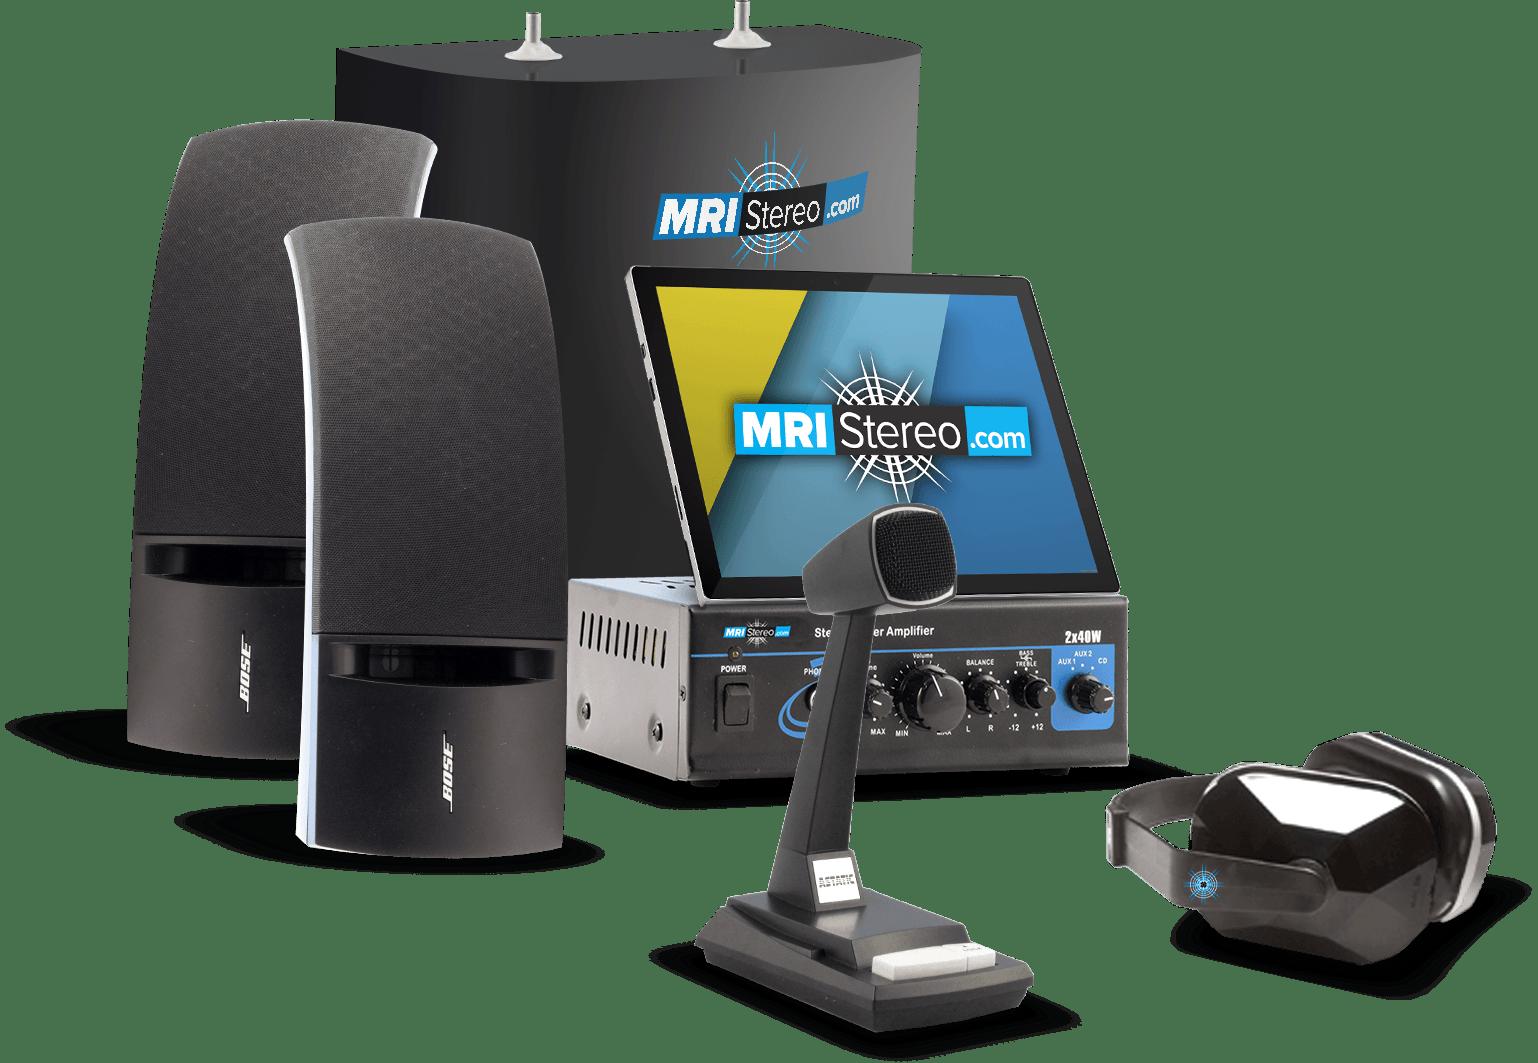 Premiere MRI Stereo Touch